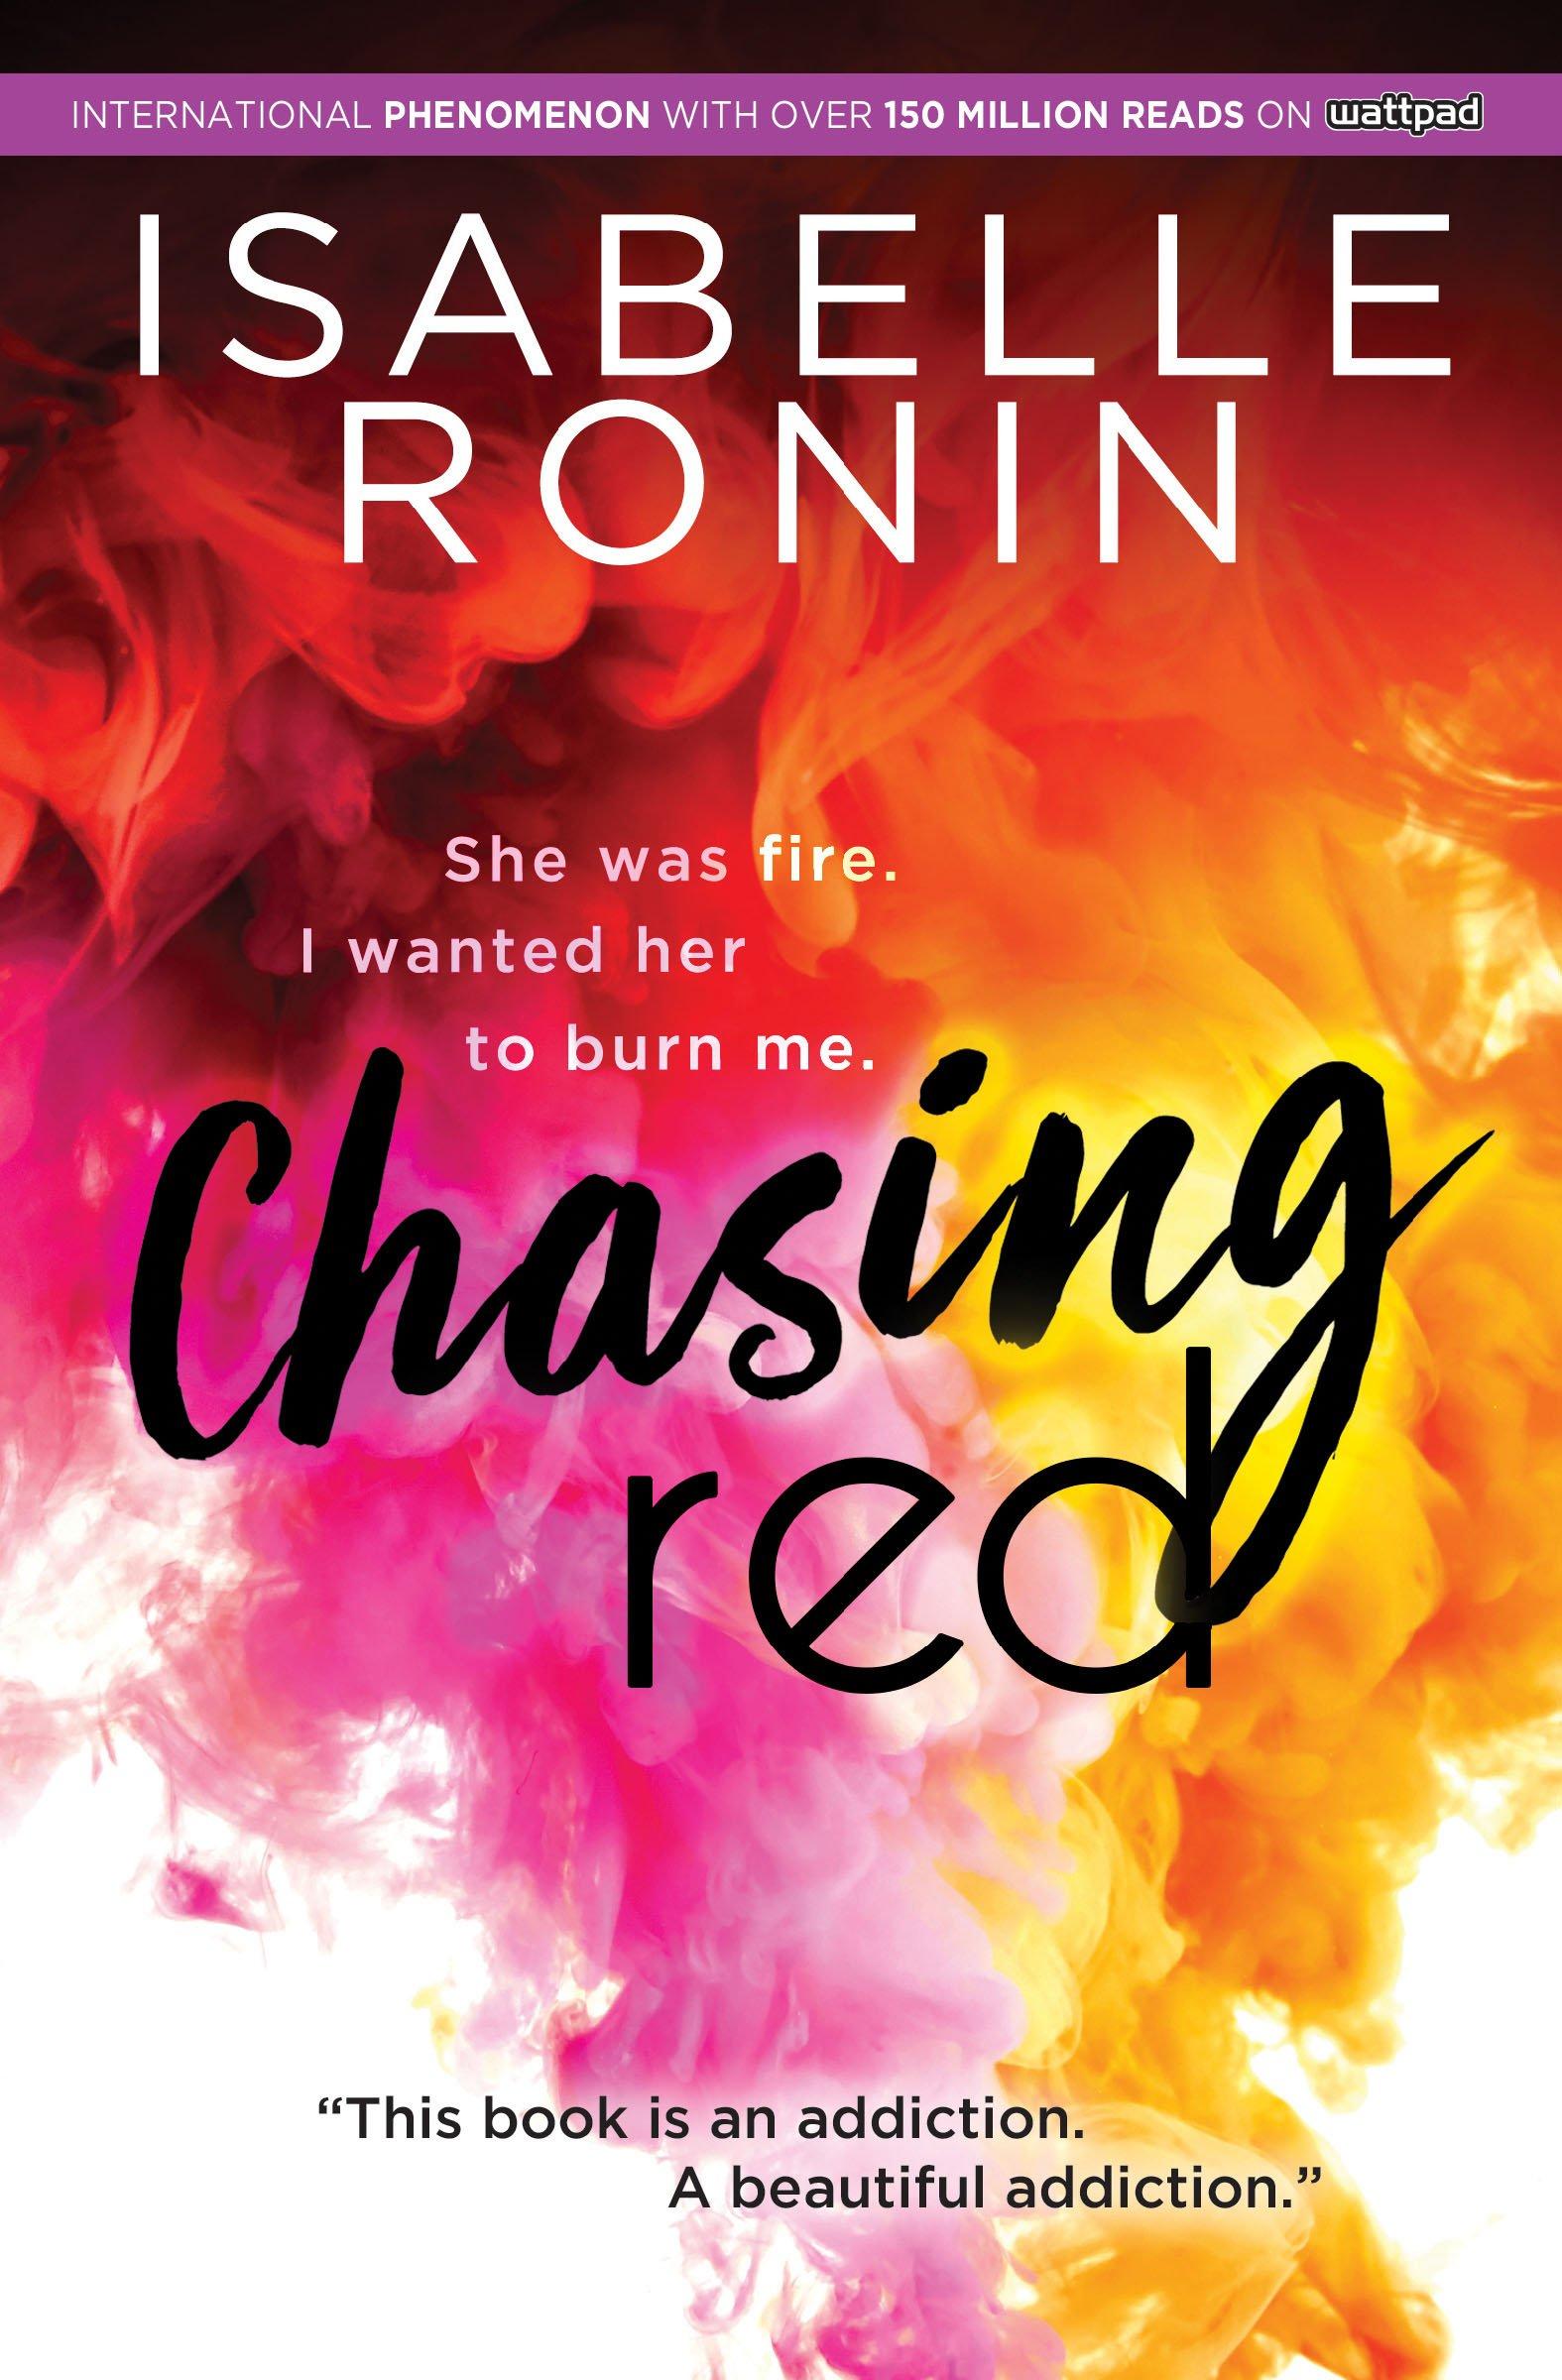 Chasing Red (Chasing Red Book 1): Amazon.es: Isabelle Ronin: Libros en idiomas extranjeros